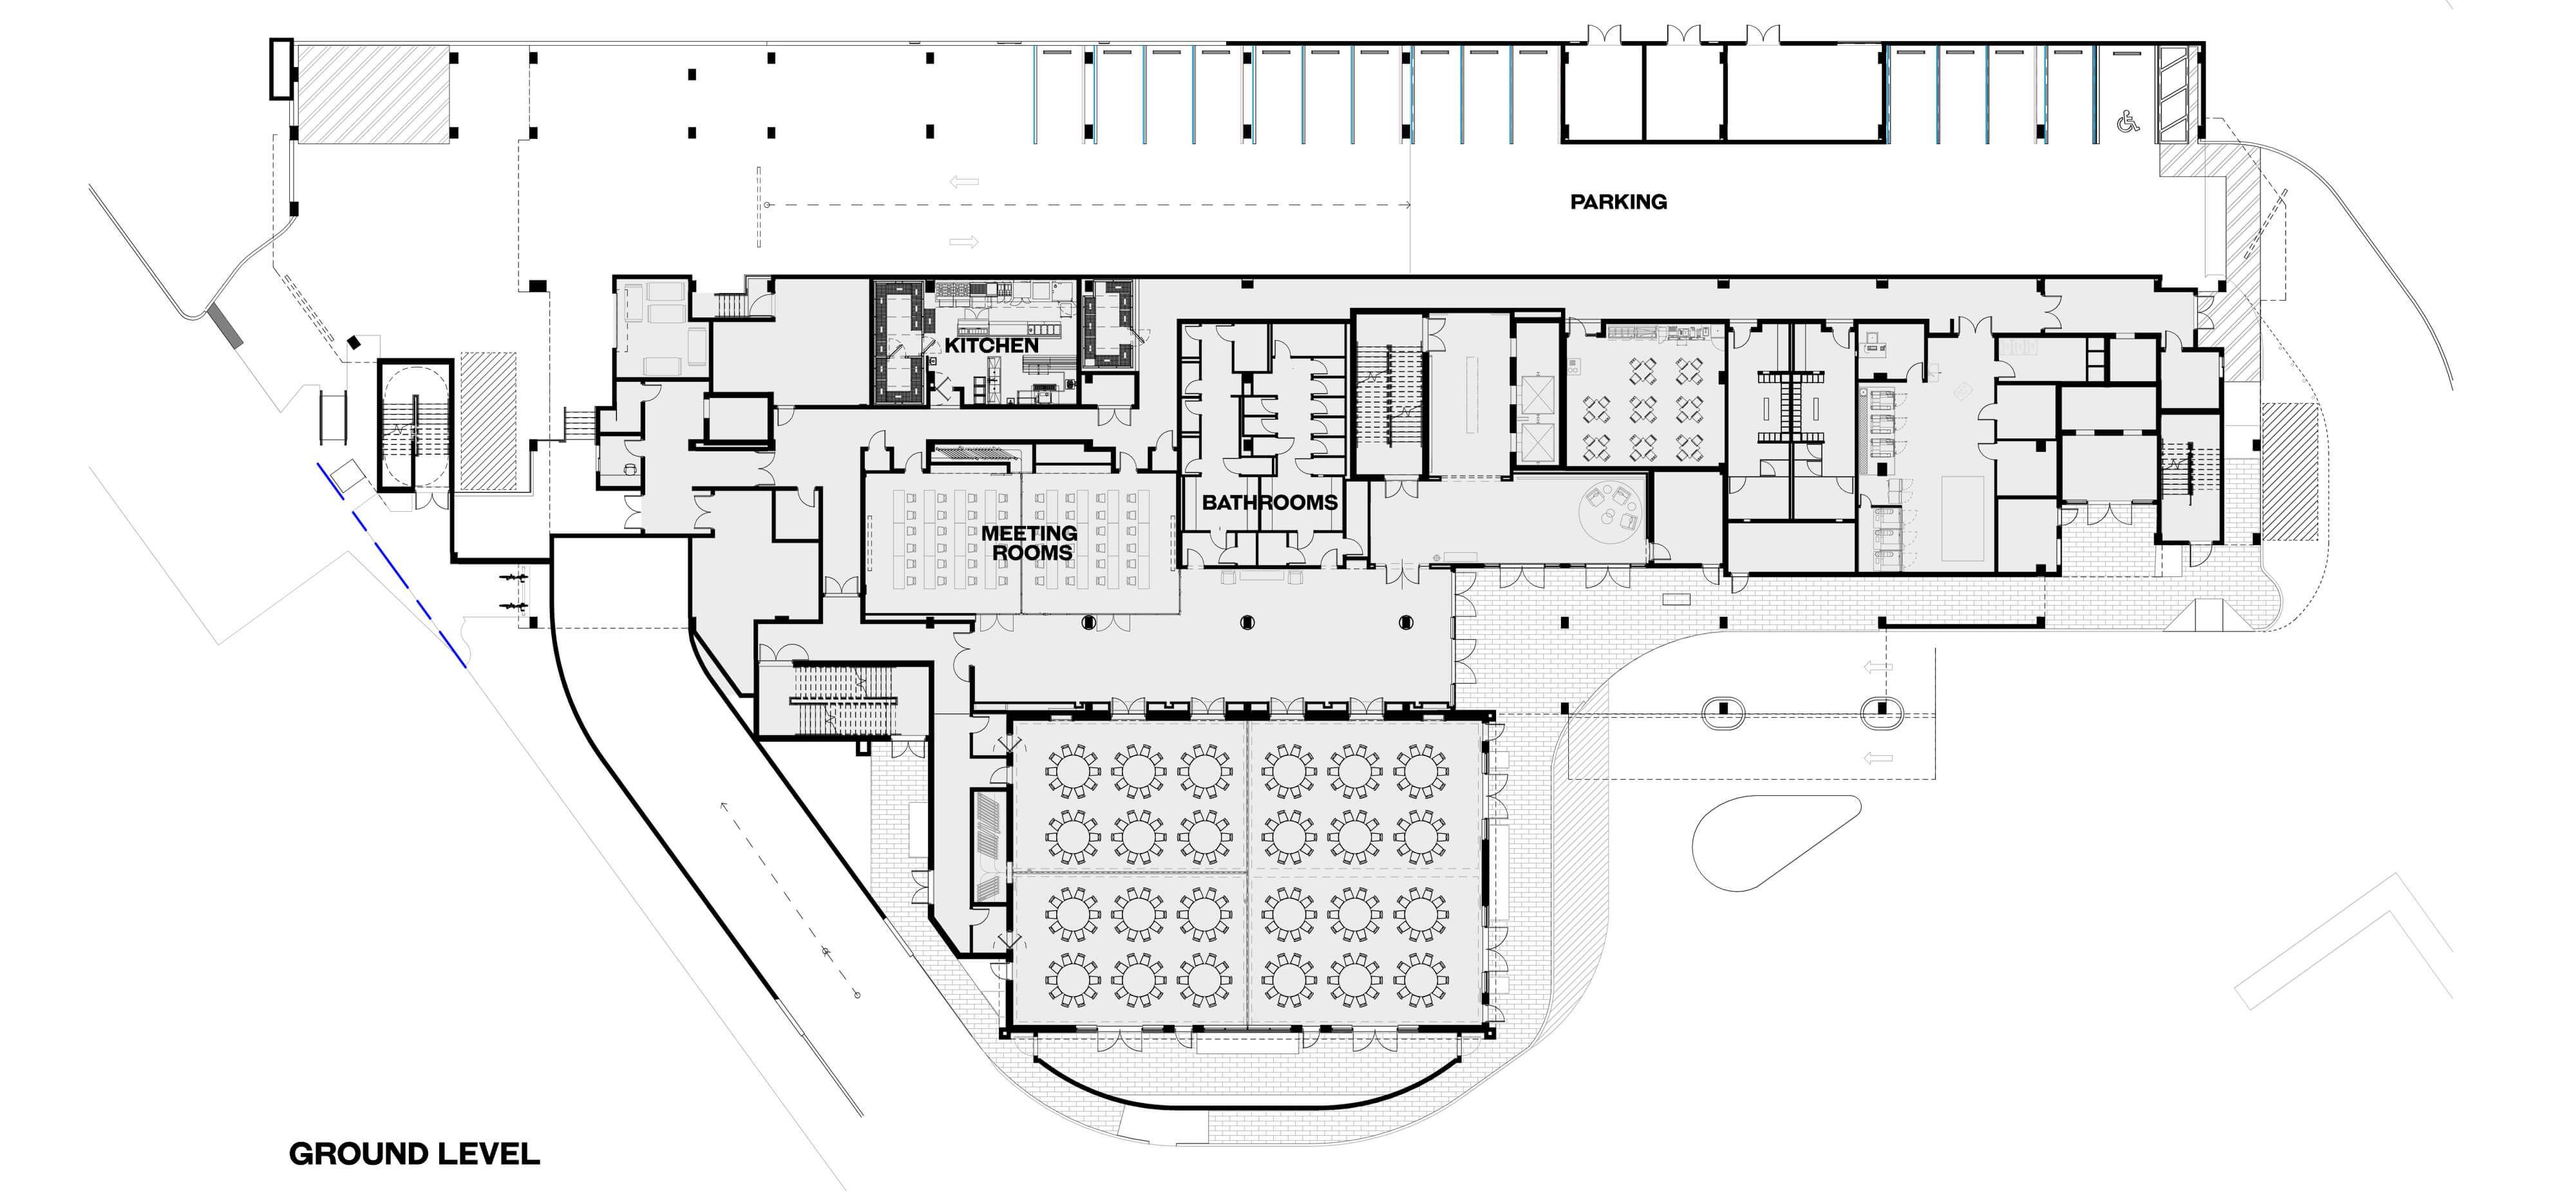 Aventura Hilton Hotel Ground Floor Hotel Room Design Plan Hotel Lobby Design Hotel Room Design